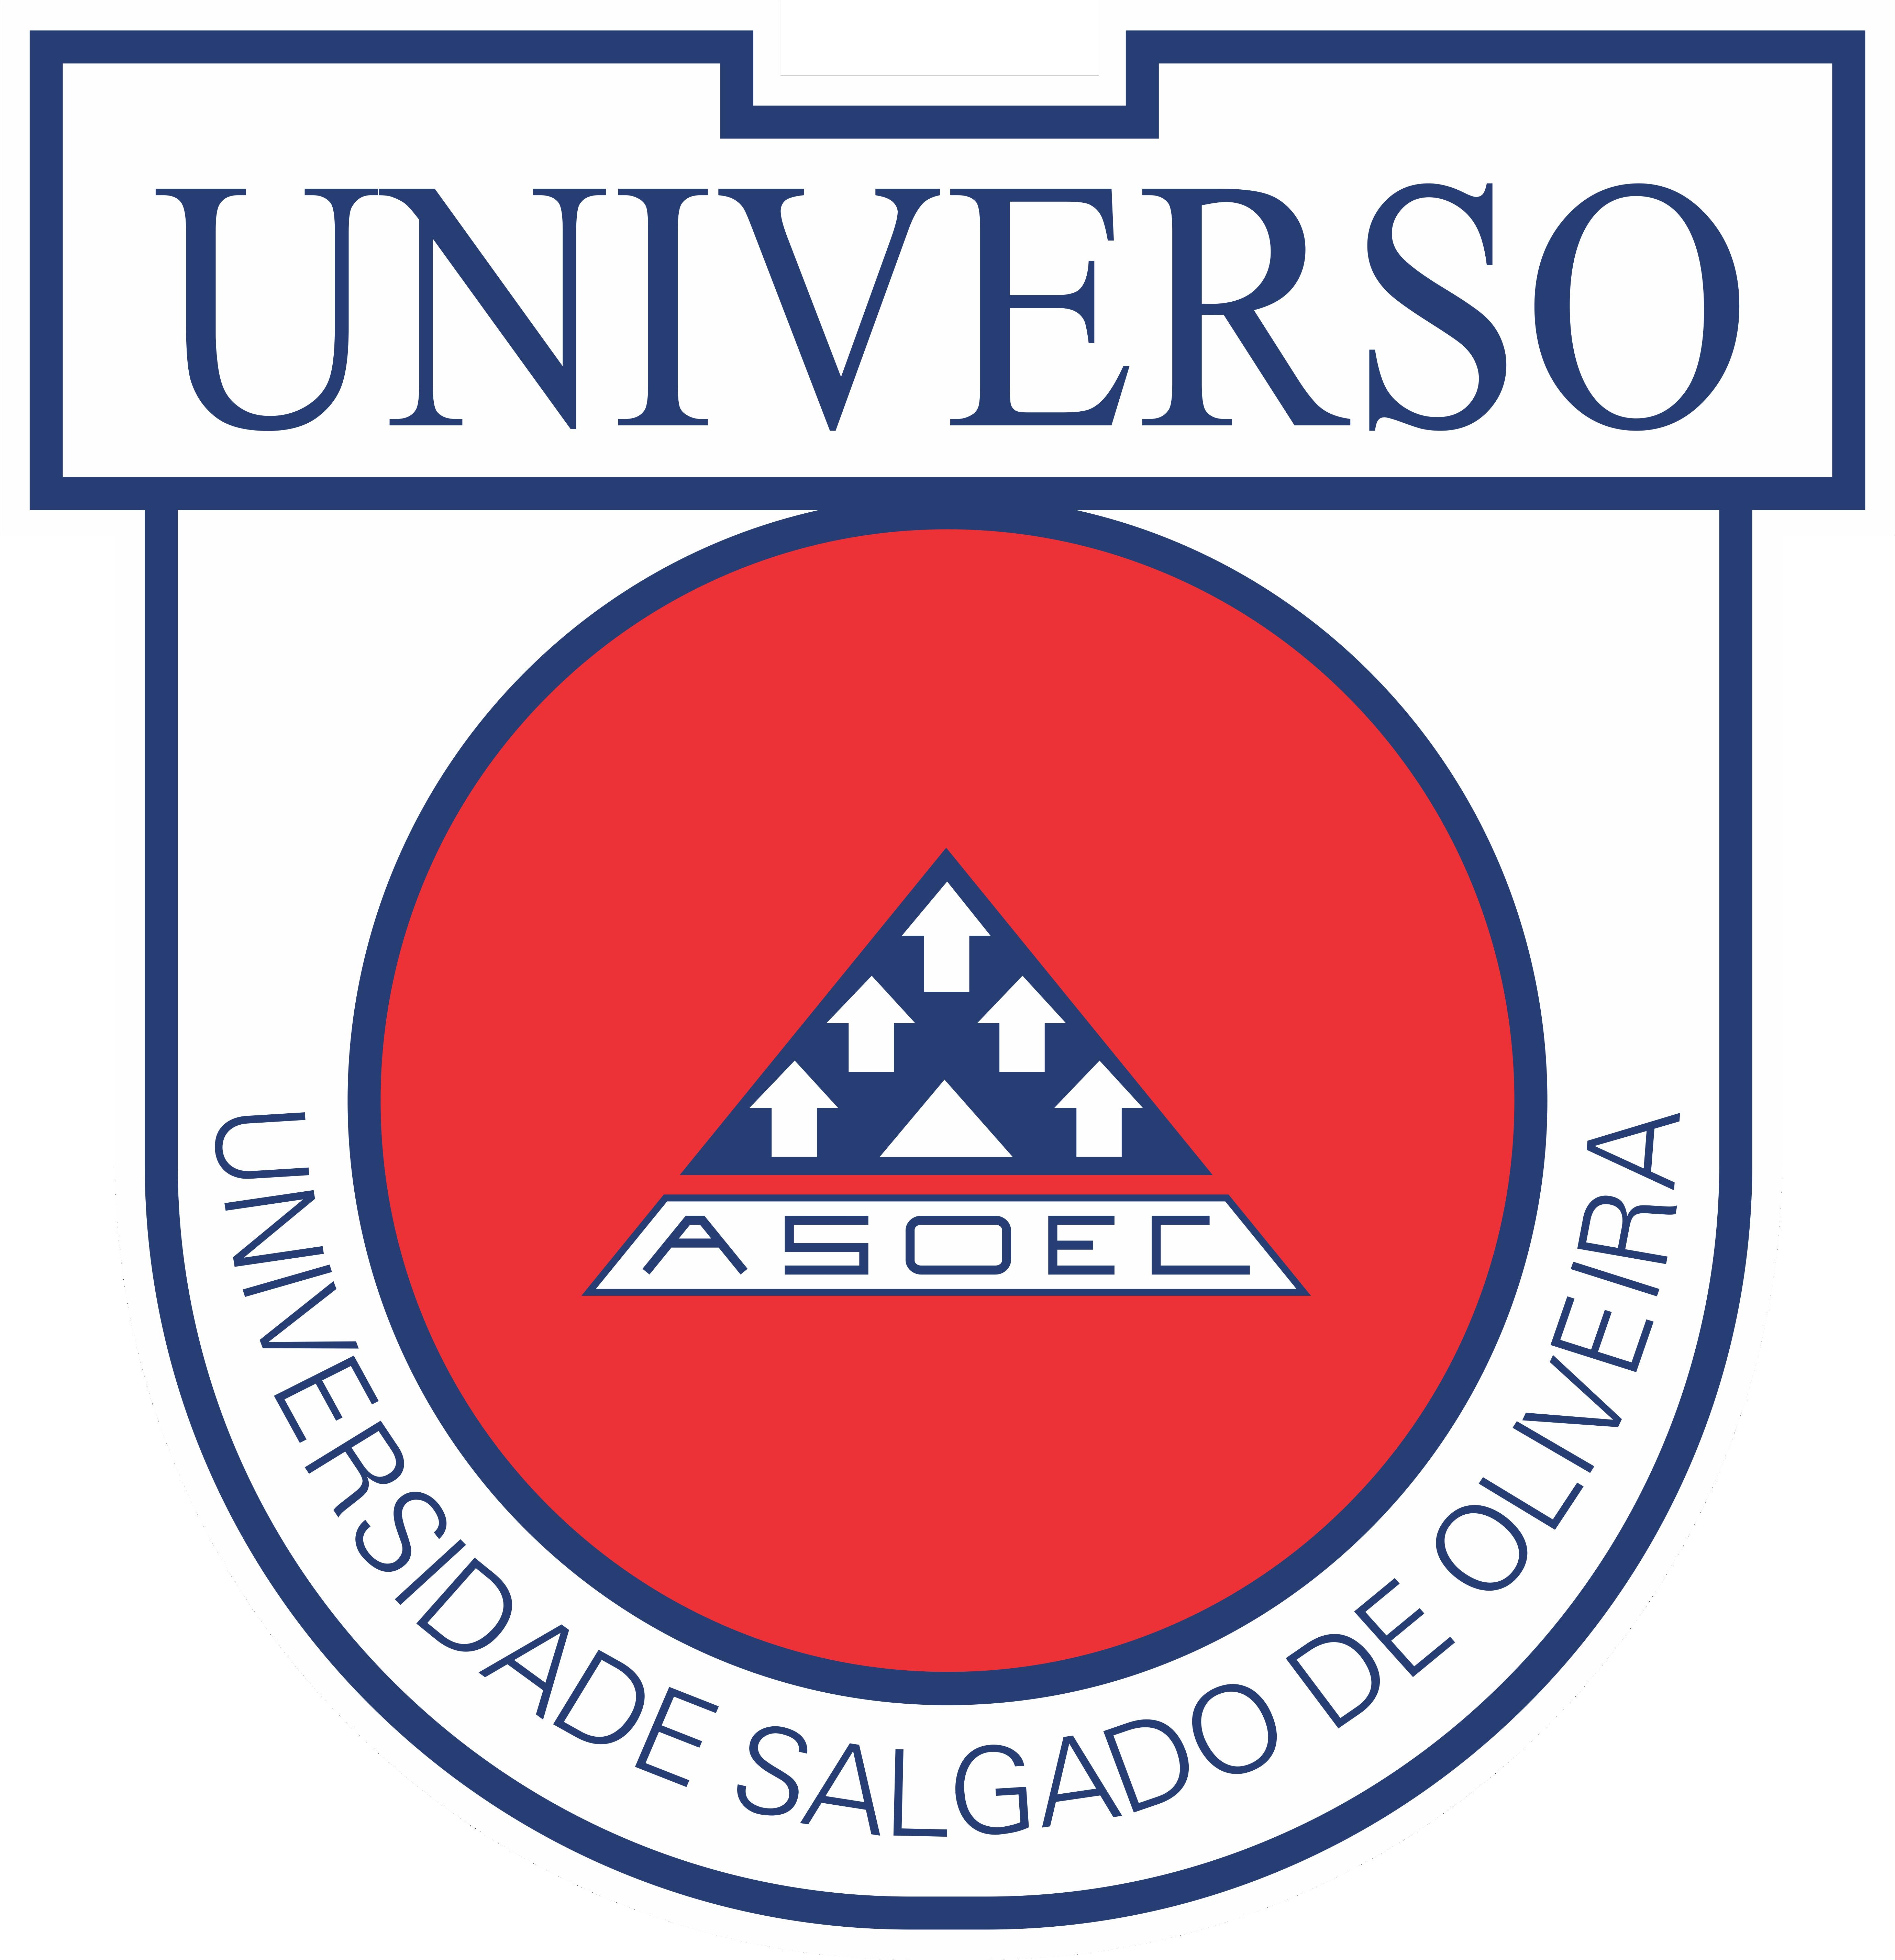 https://universo.edu.br/